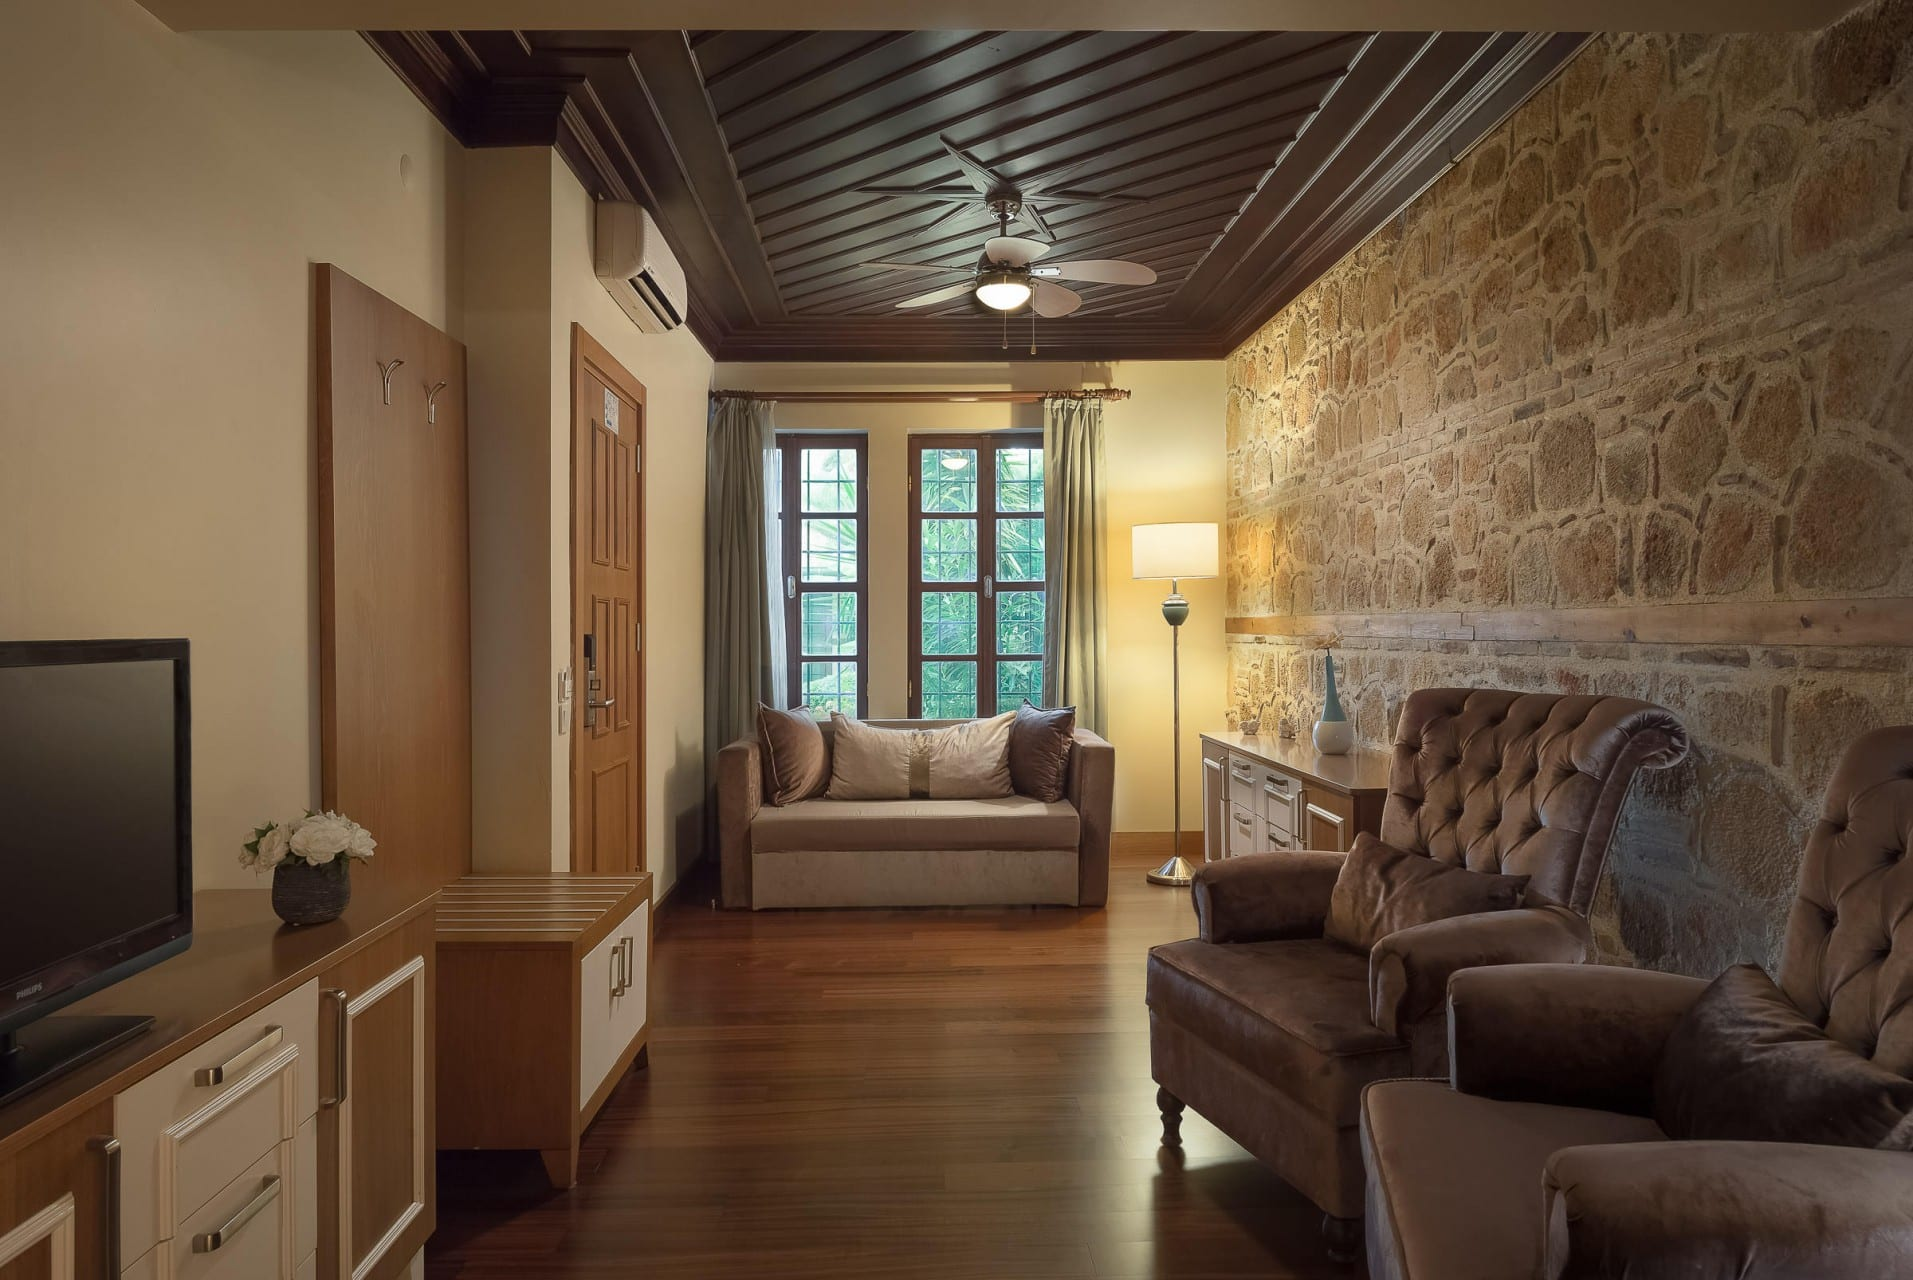 Best Architecture Photographer - Prana Resorts Thailand    Dogan Hotel Antalya kaleici Suite Living Room